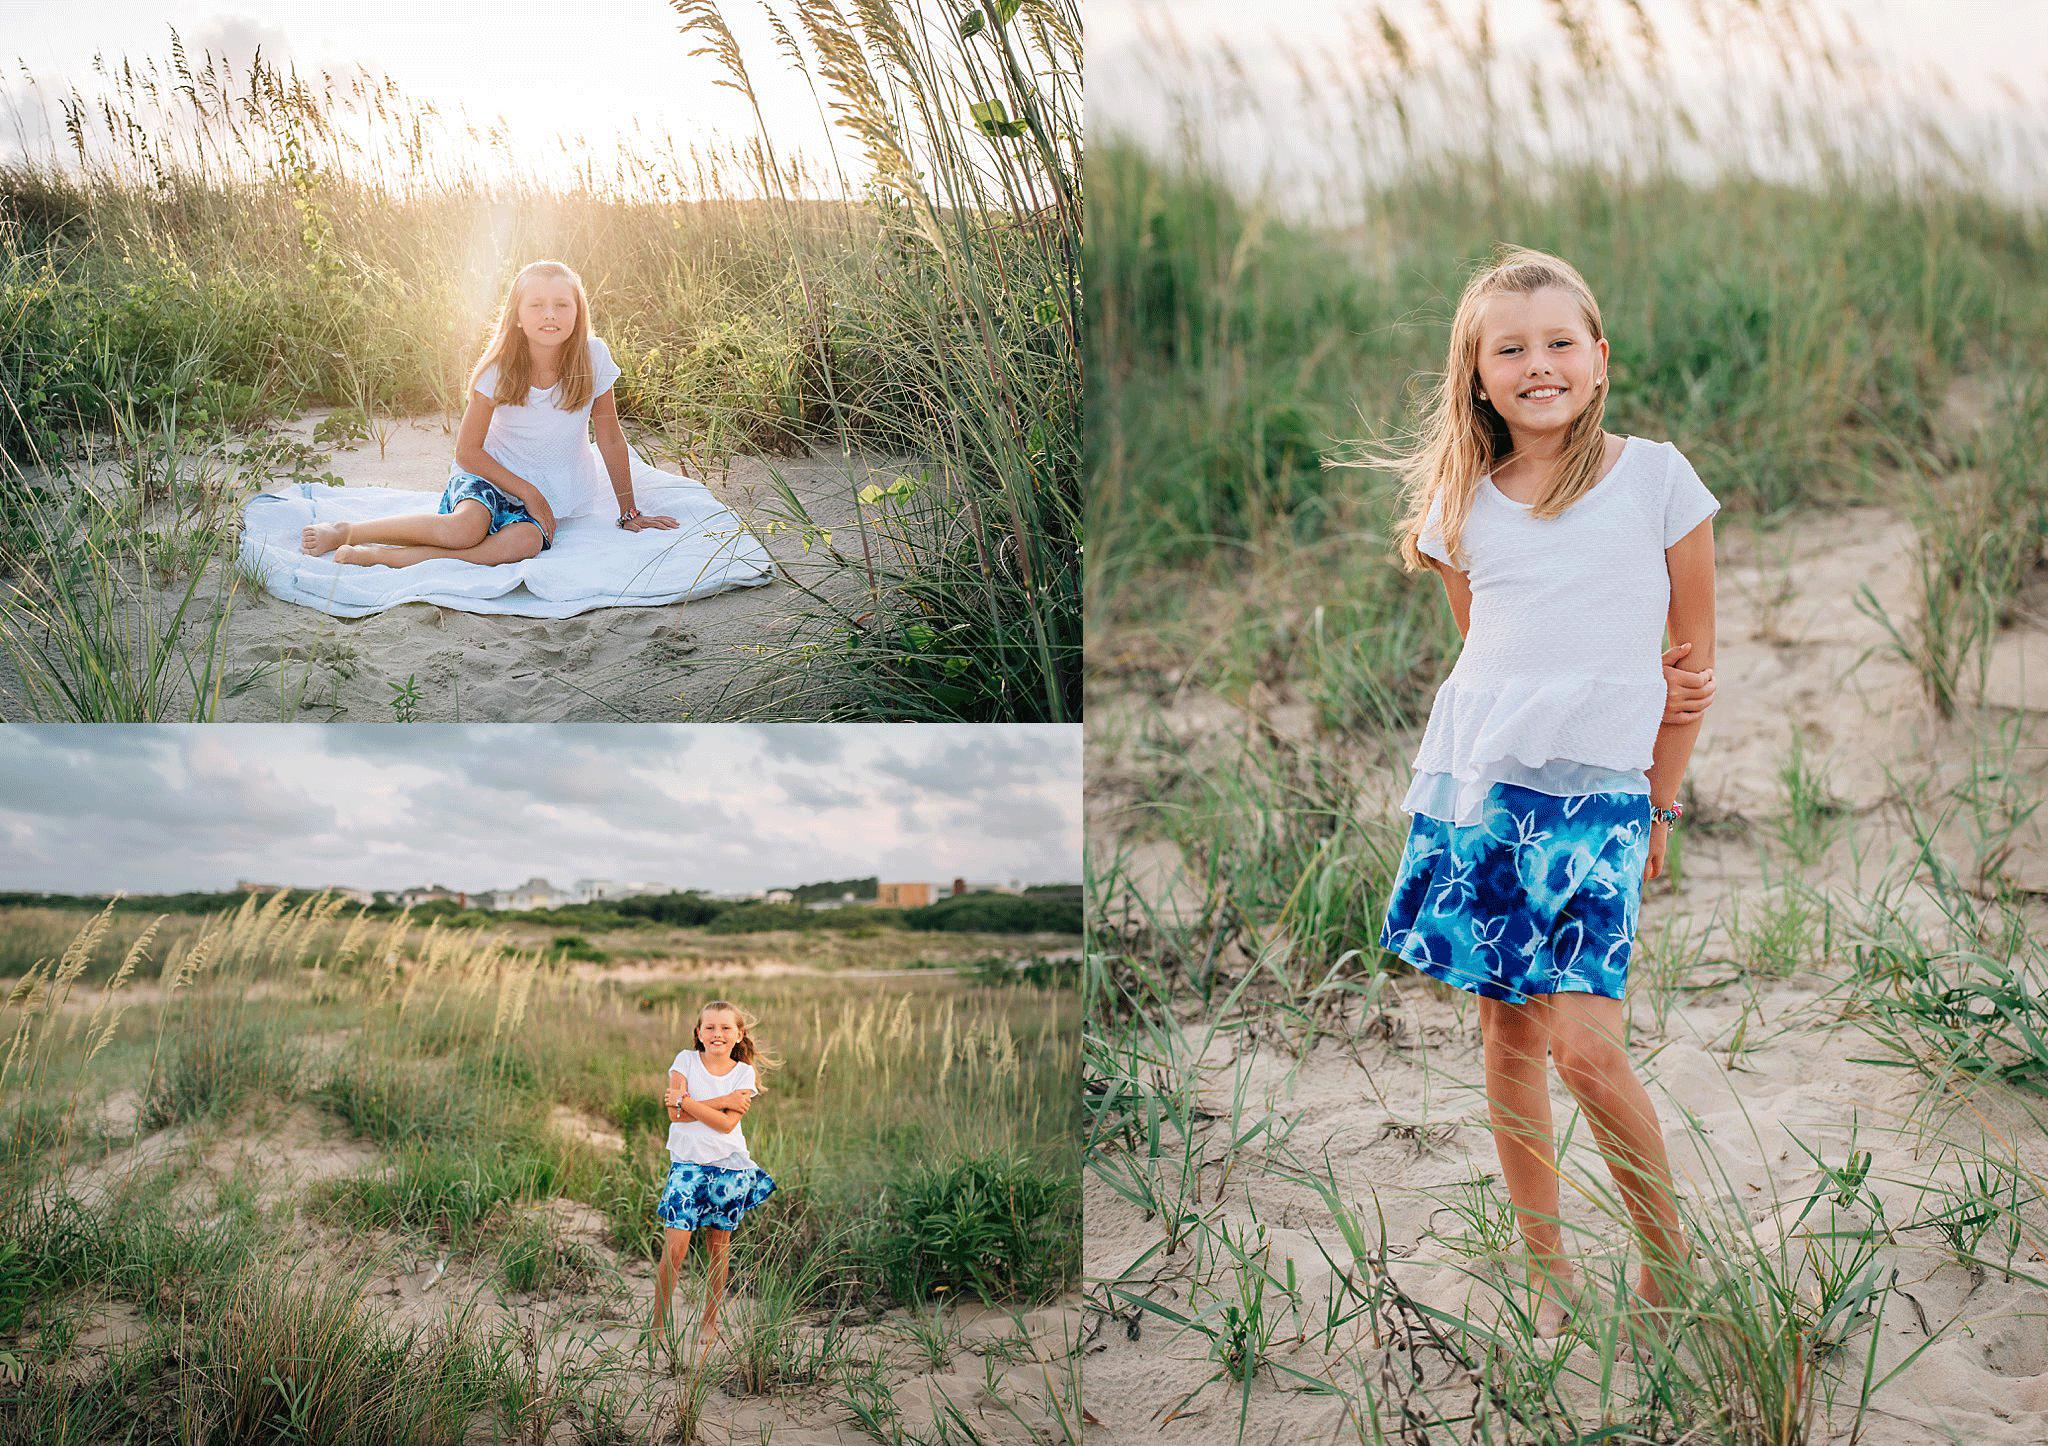 family-photographers-virginia-beach-sandbridge-norfolk-portsmouth-chesapeake-pro-photographer-melissa-bliss-photography.png